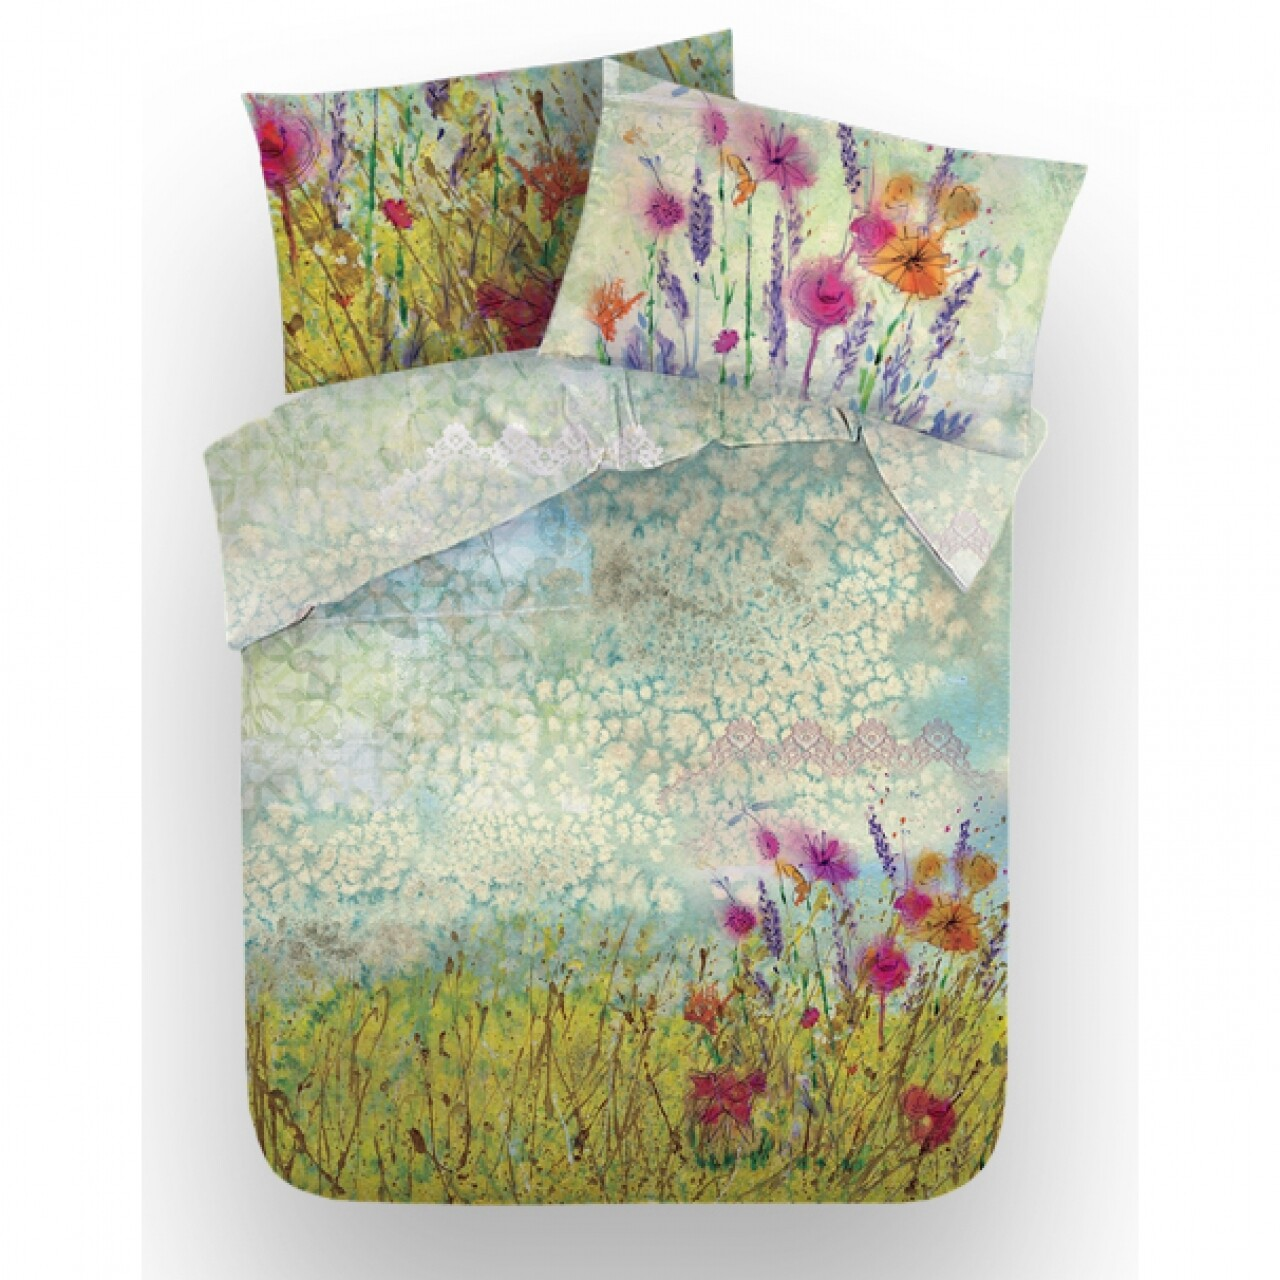 Lenjerie de pat dubla Light, Aglika, 3 piese, 200 x 220 cm, 100% bumbac, multicolora